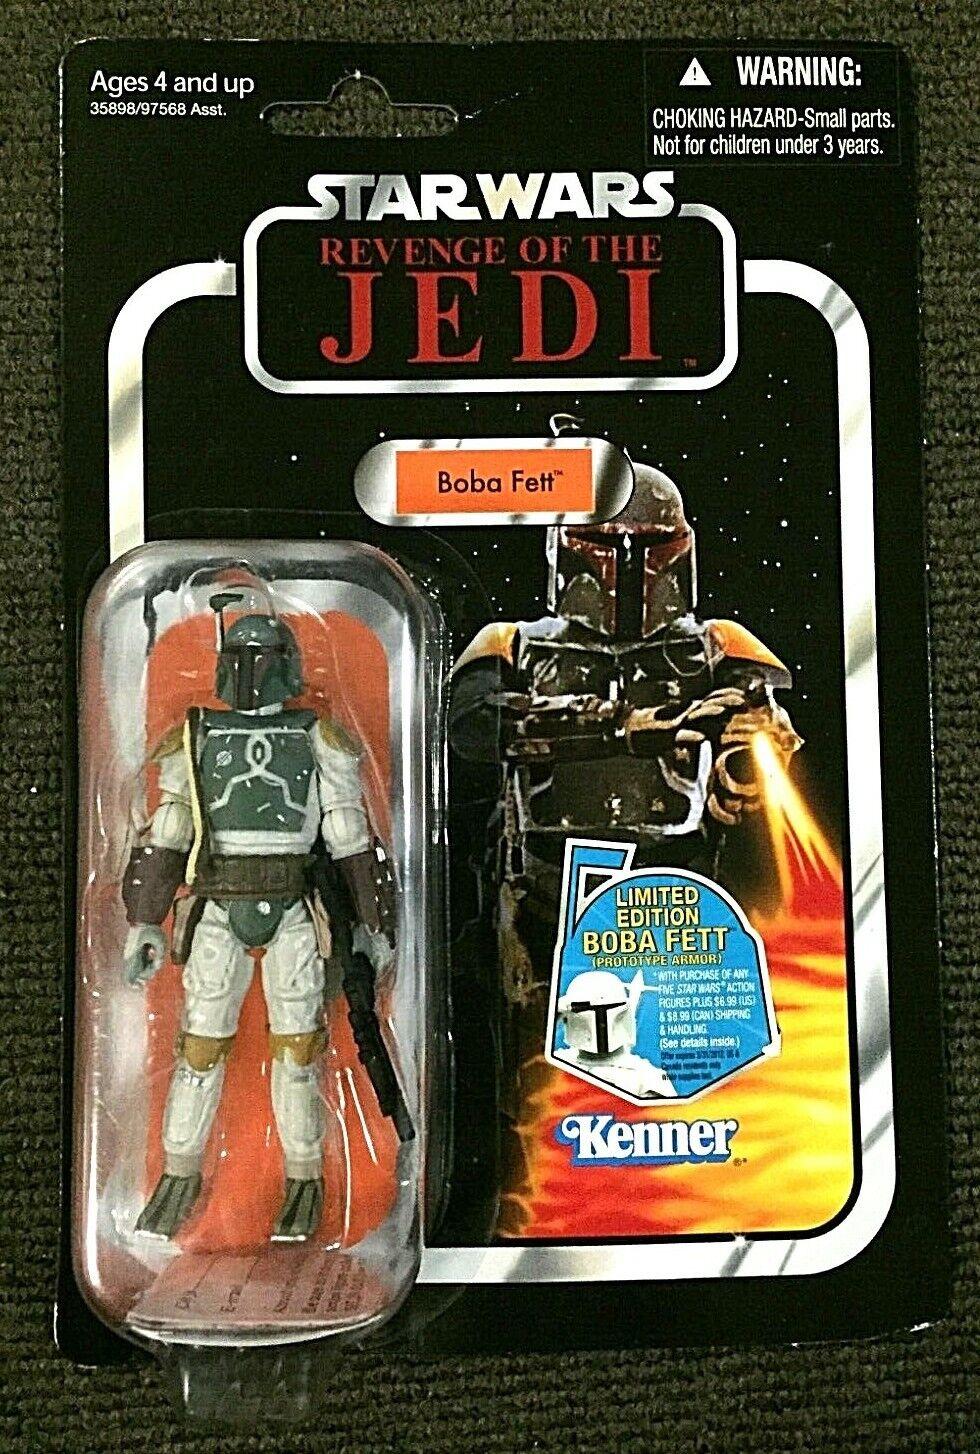 Boba Fett VC09 Star Wars The Vintage Collection Revenge of the Jedi Rare Variant